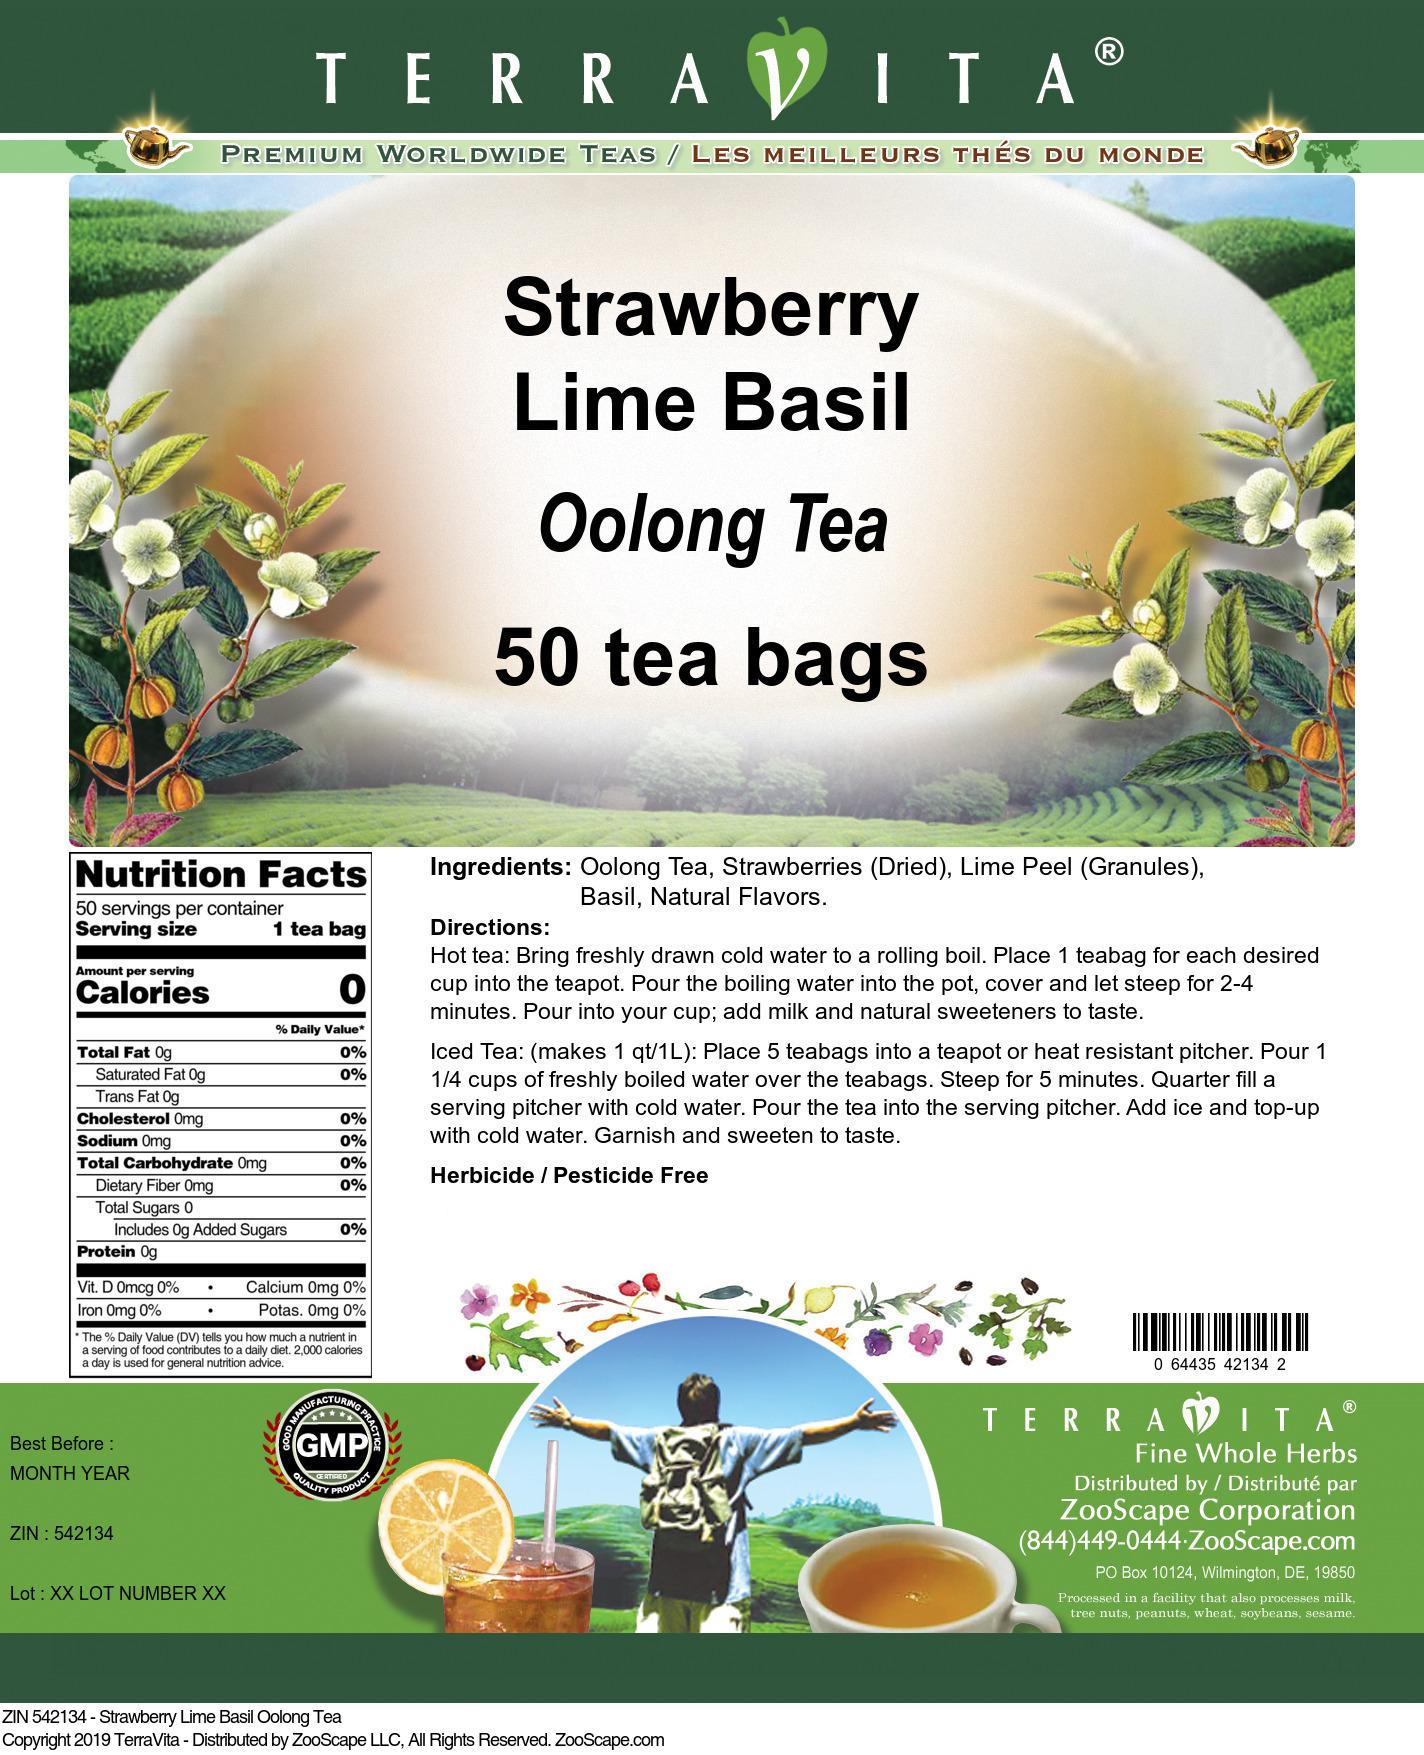 Strawberry Lime Basil Oolong Tea